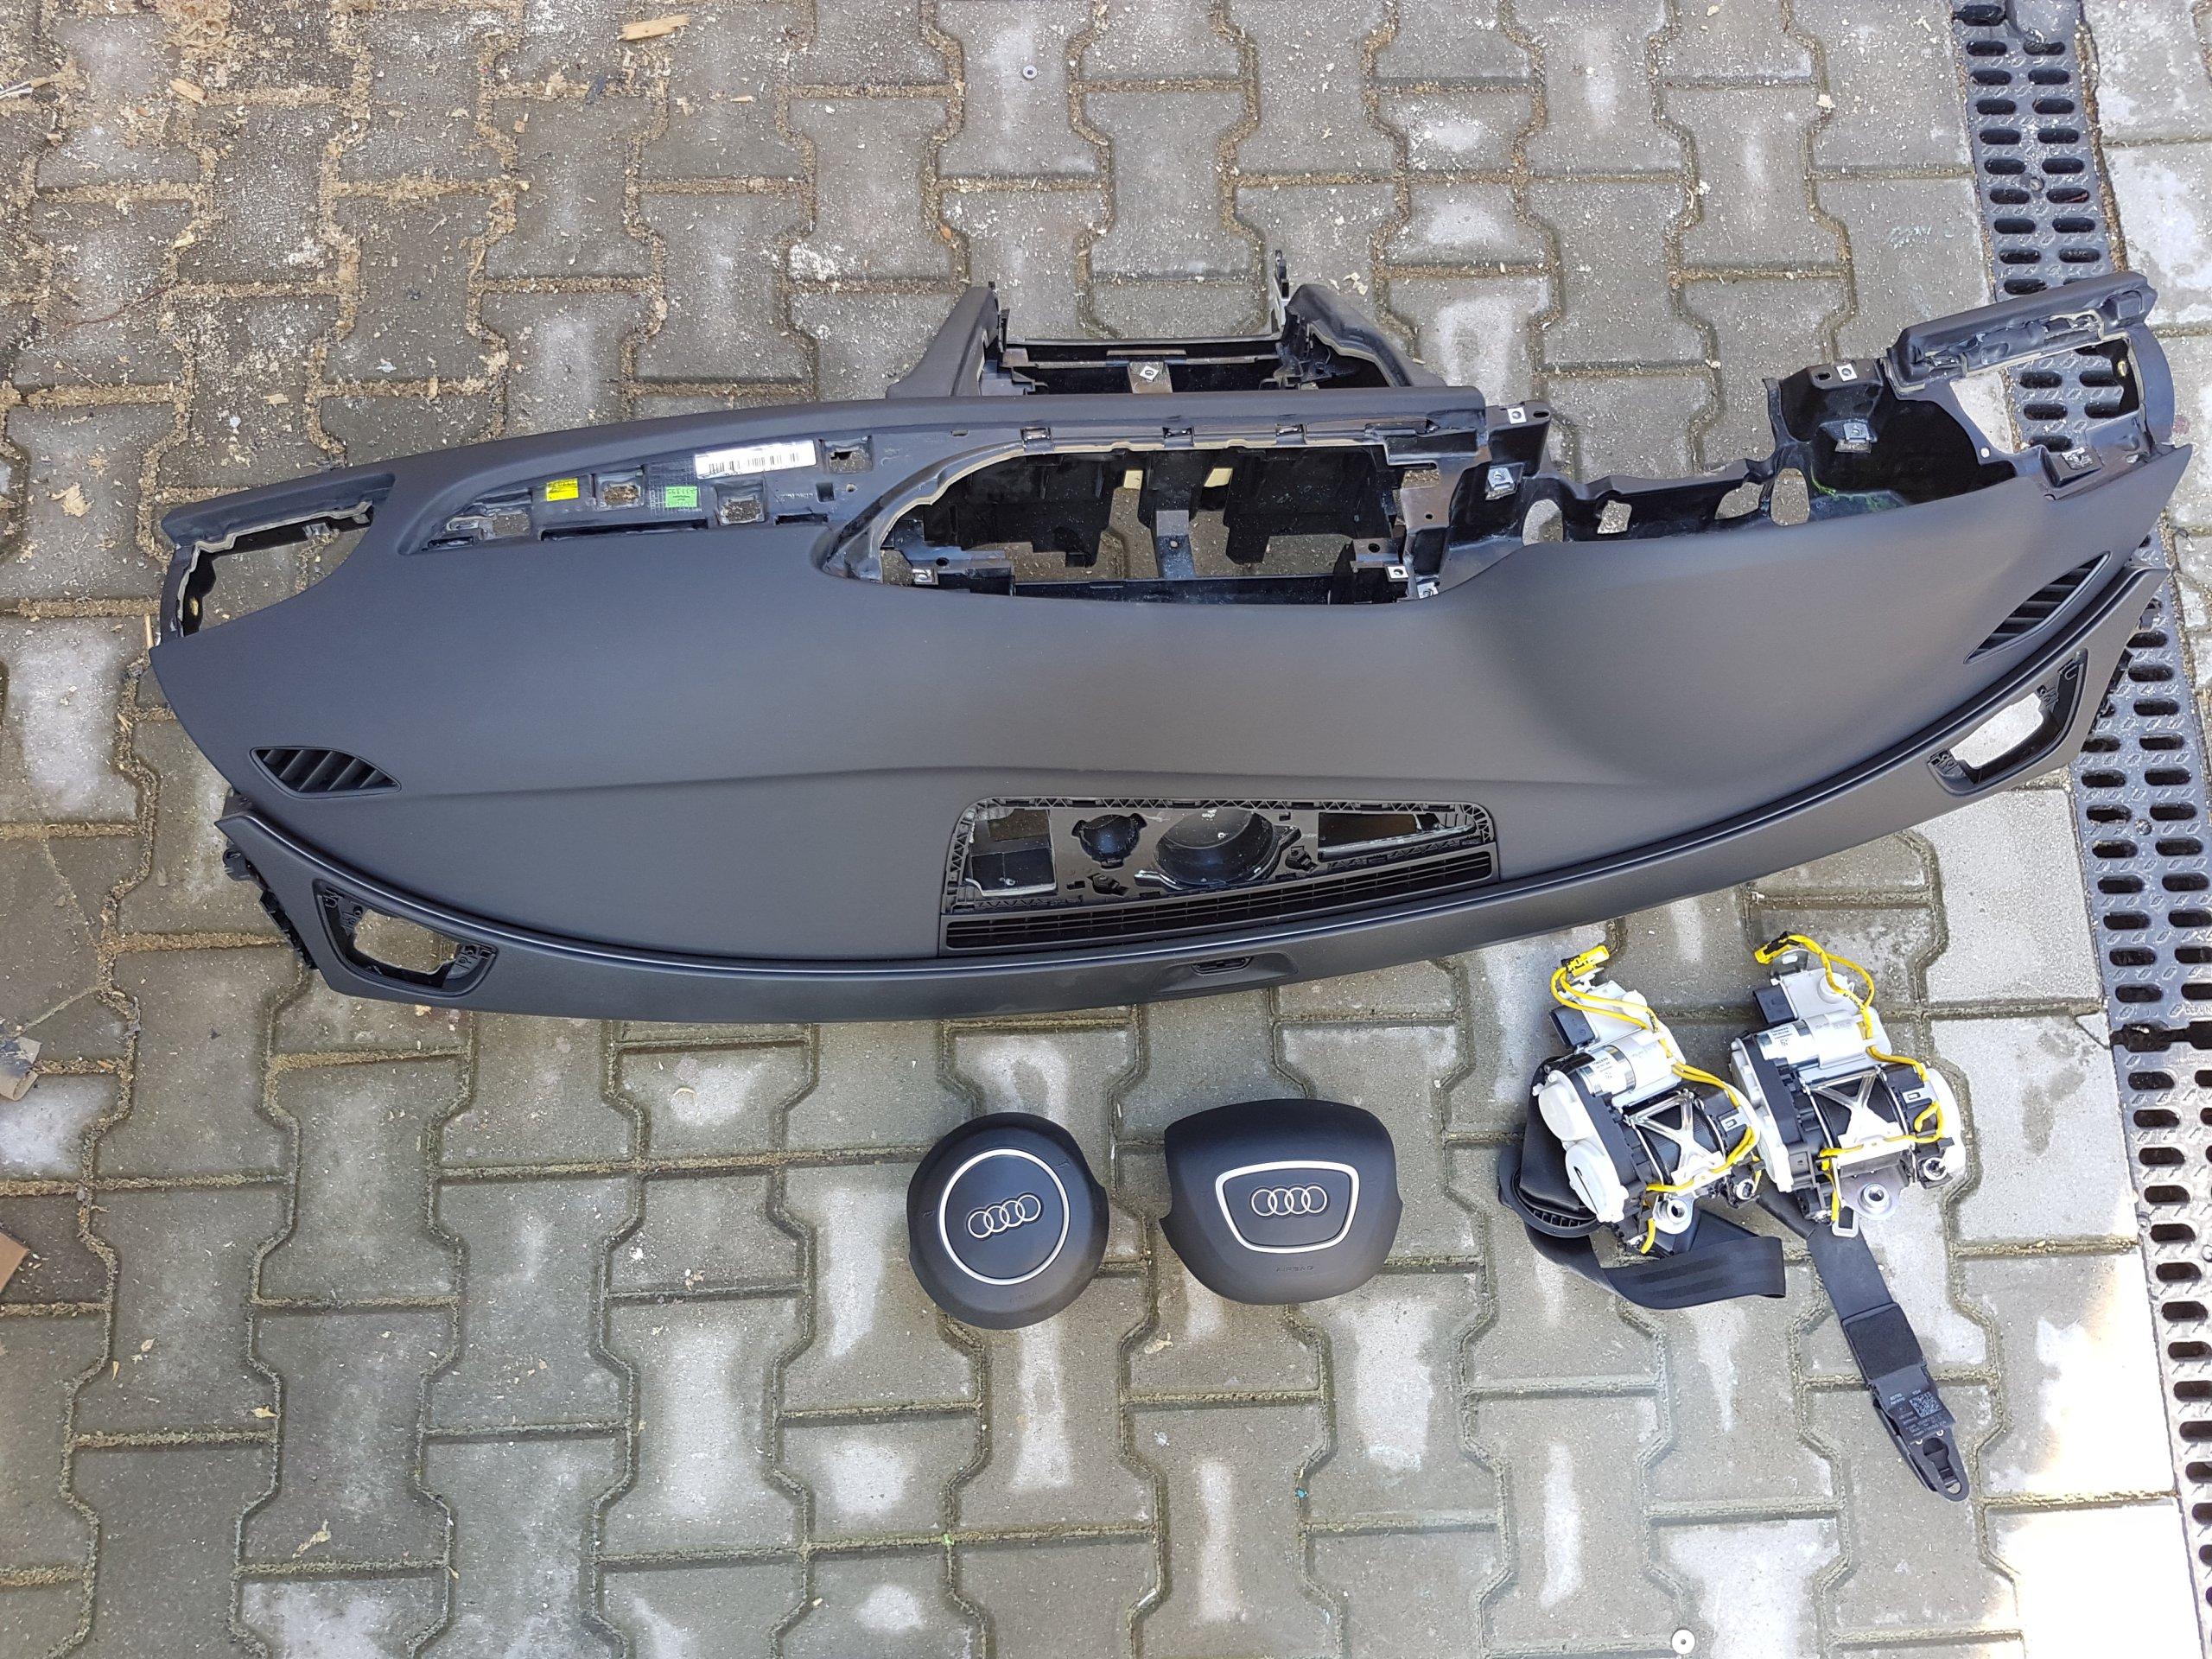 audi a6 a7 c7 s6 rs6 4g доска airbag ремни консоль